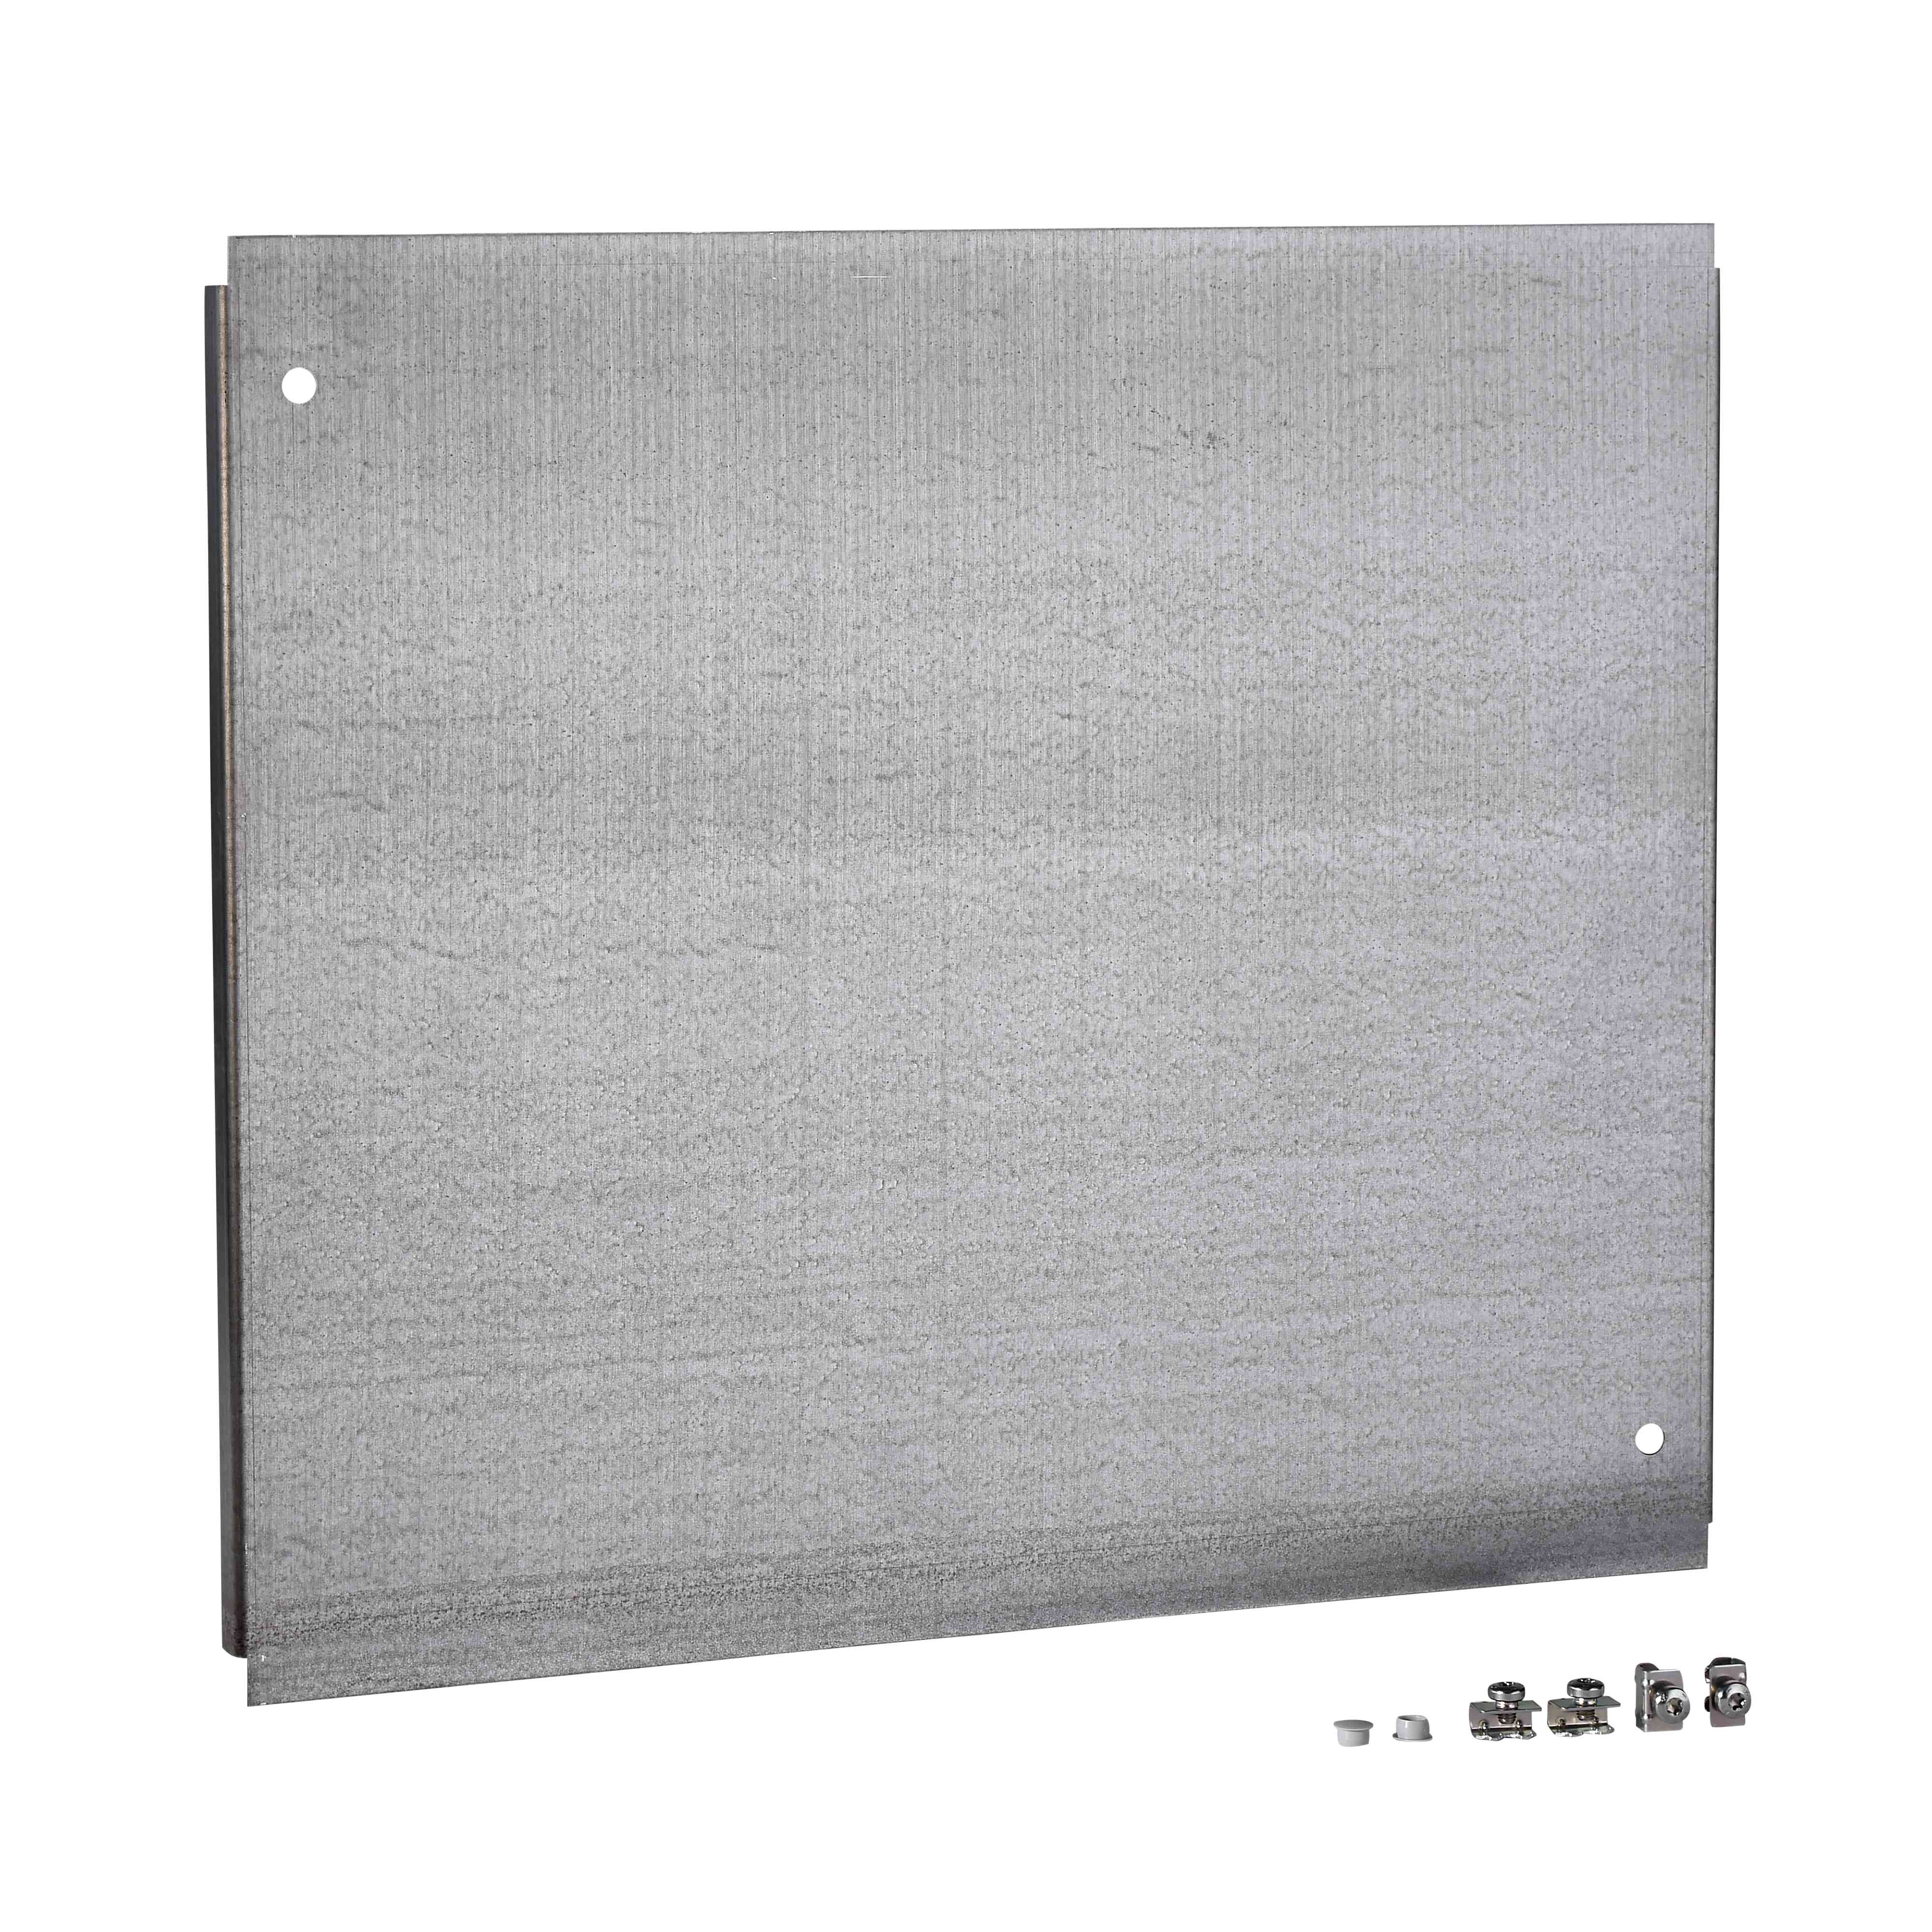 Spacial SF navadna plošča kab. uvodnice - pritr. s sponkami - 1000 x 800 mm